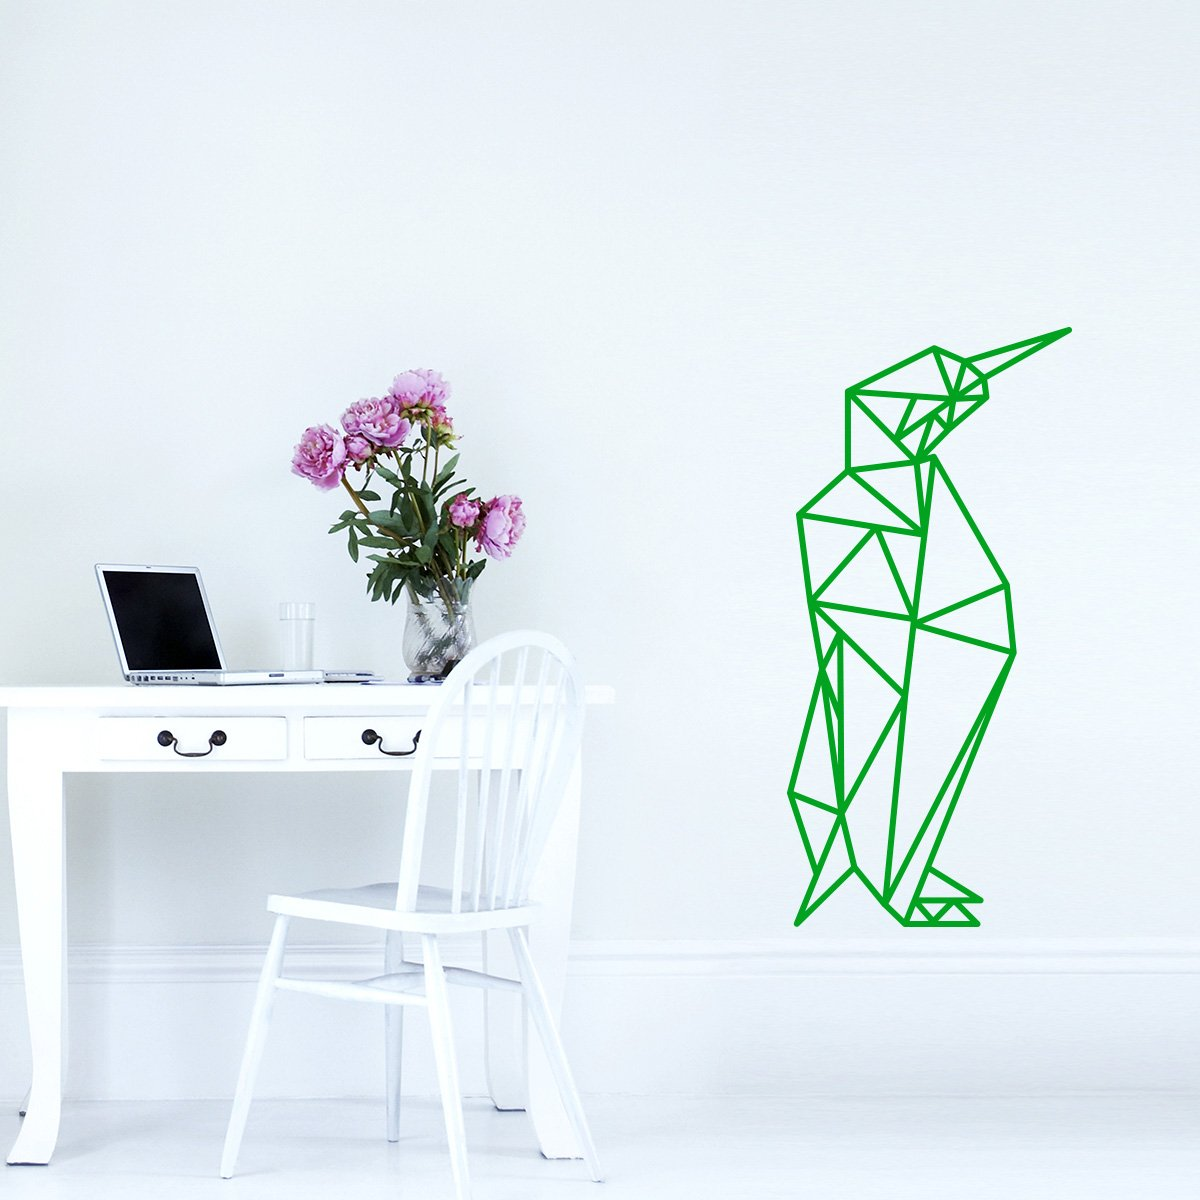 WANDKINGS Wandtattoo - Origami-Style Pinguin - 52 x 110 cm cm cm - HellRosa - Wähle aus 5 Größen & 35 Farben B07BRJ9PJX Wandsticker & Wandfiguren a32bcb